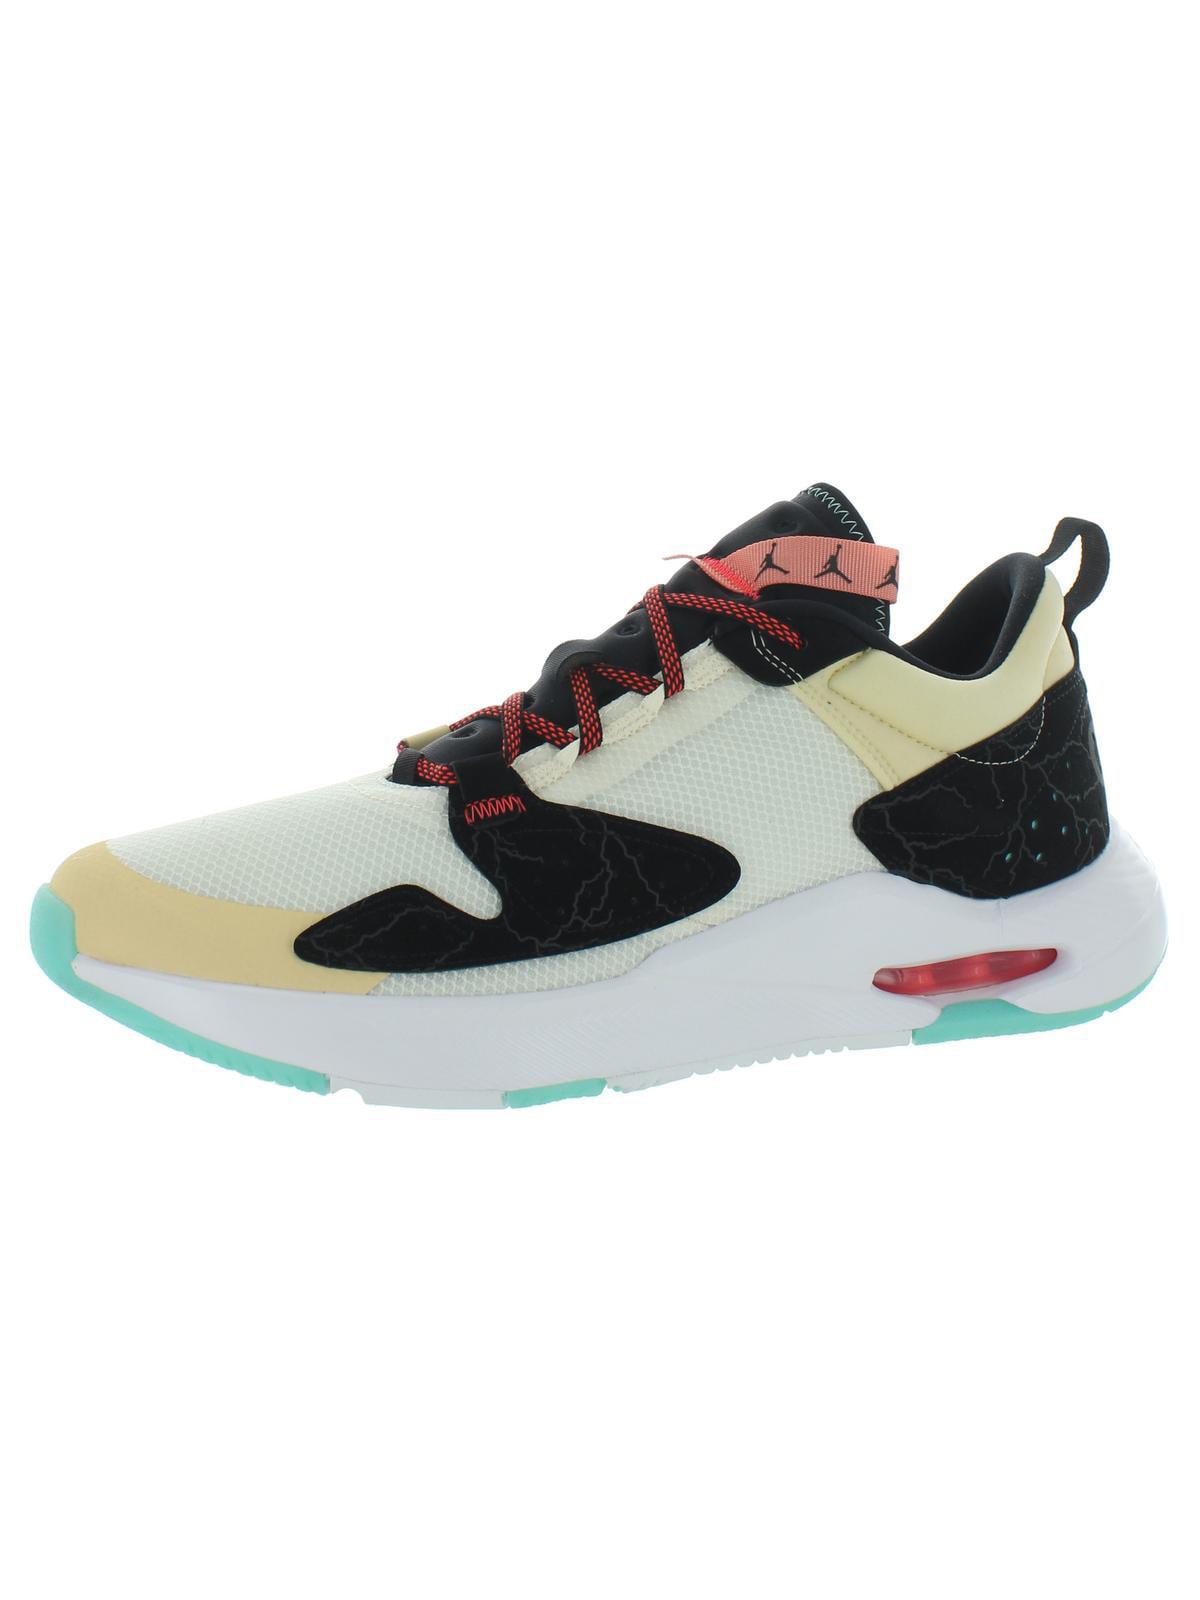 Nike - Nike Mens Jordan Air Cadence SNC Workout Gym Running Shoes - Walmart.com